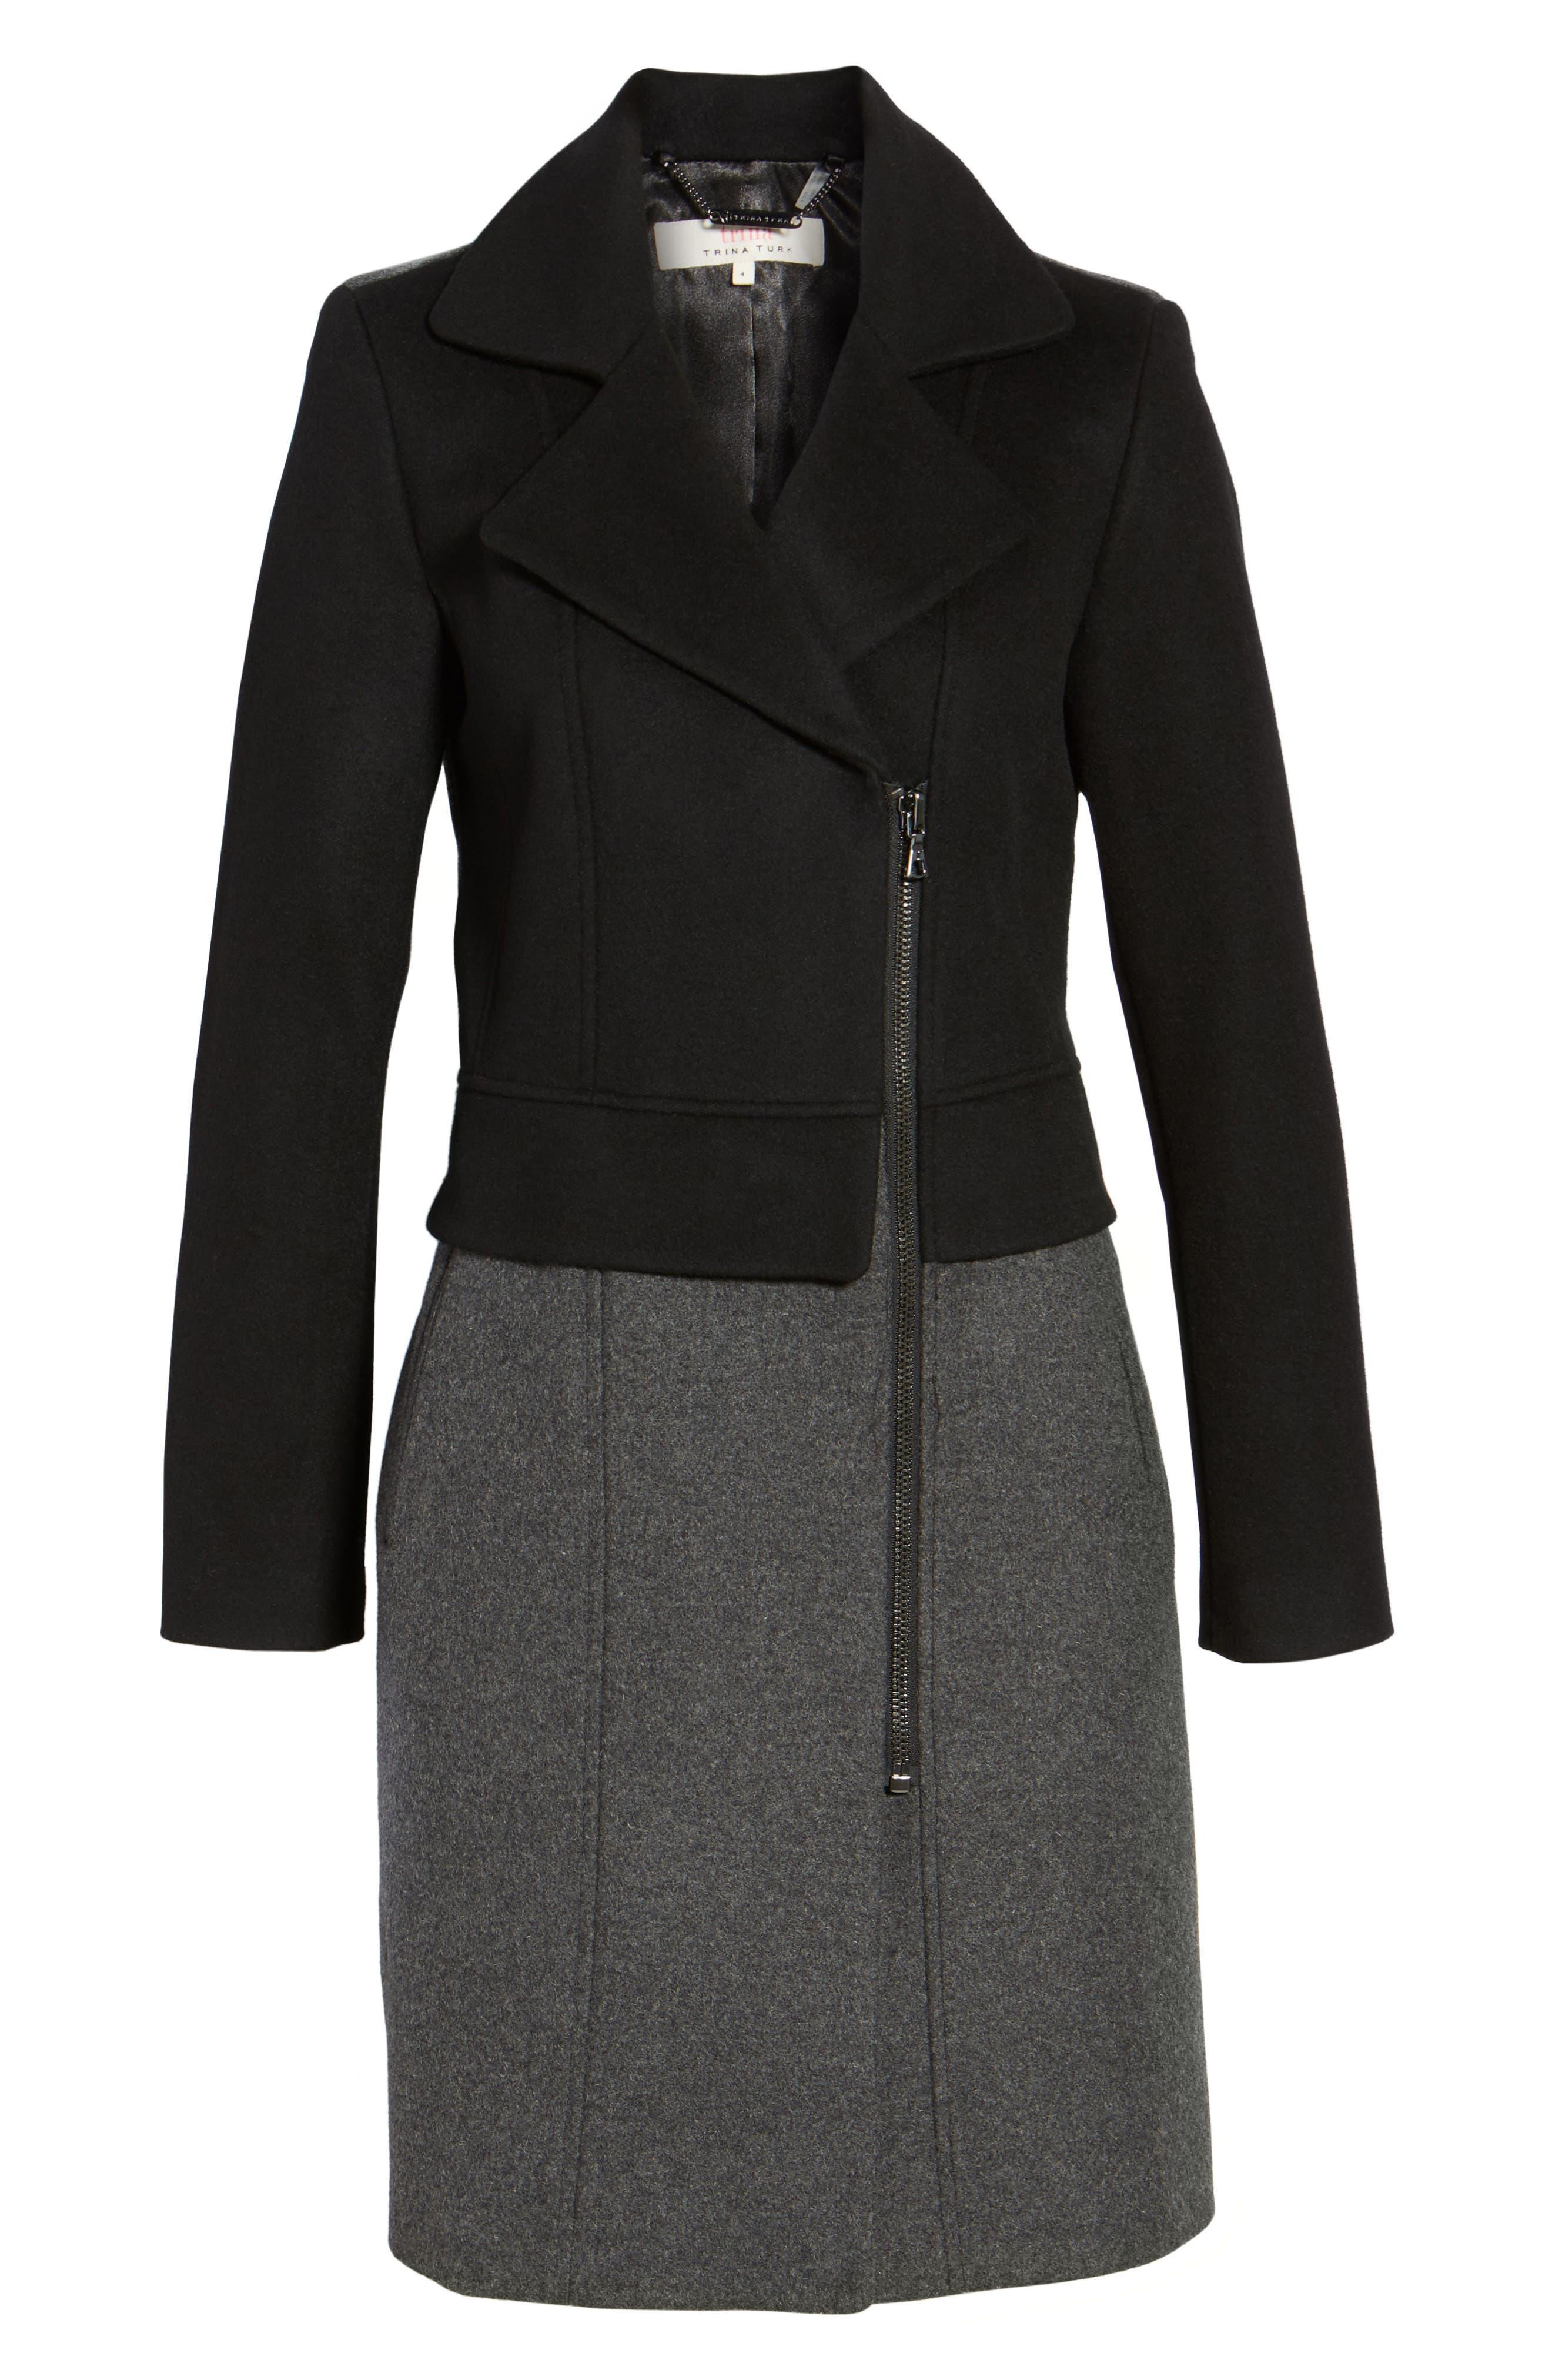 Brooklyn Colorblock Coat,                             Alternate thumbnail 6, color,                             Grey/ Black